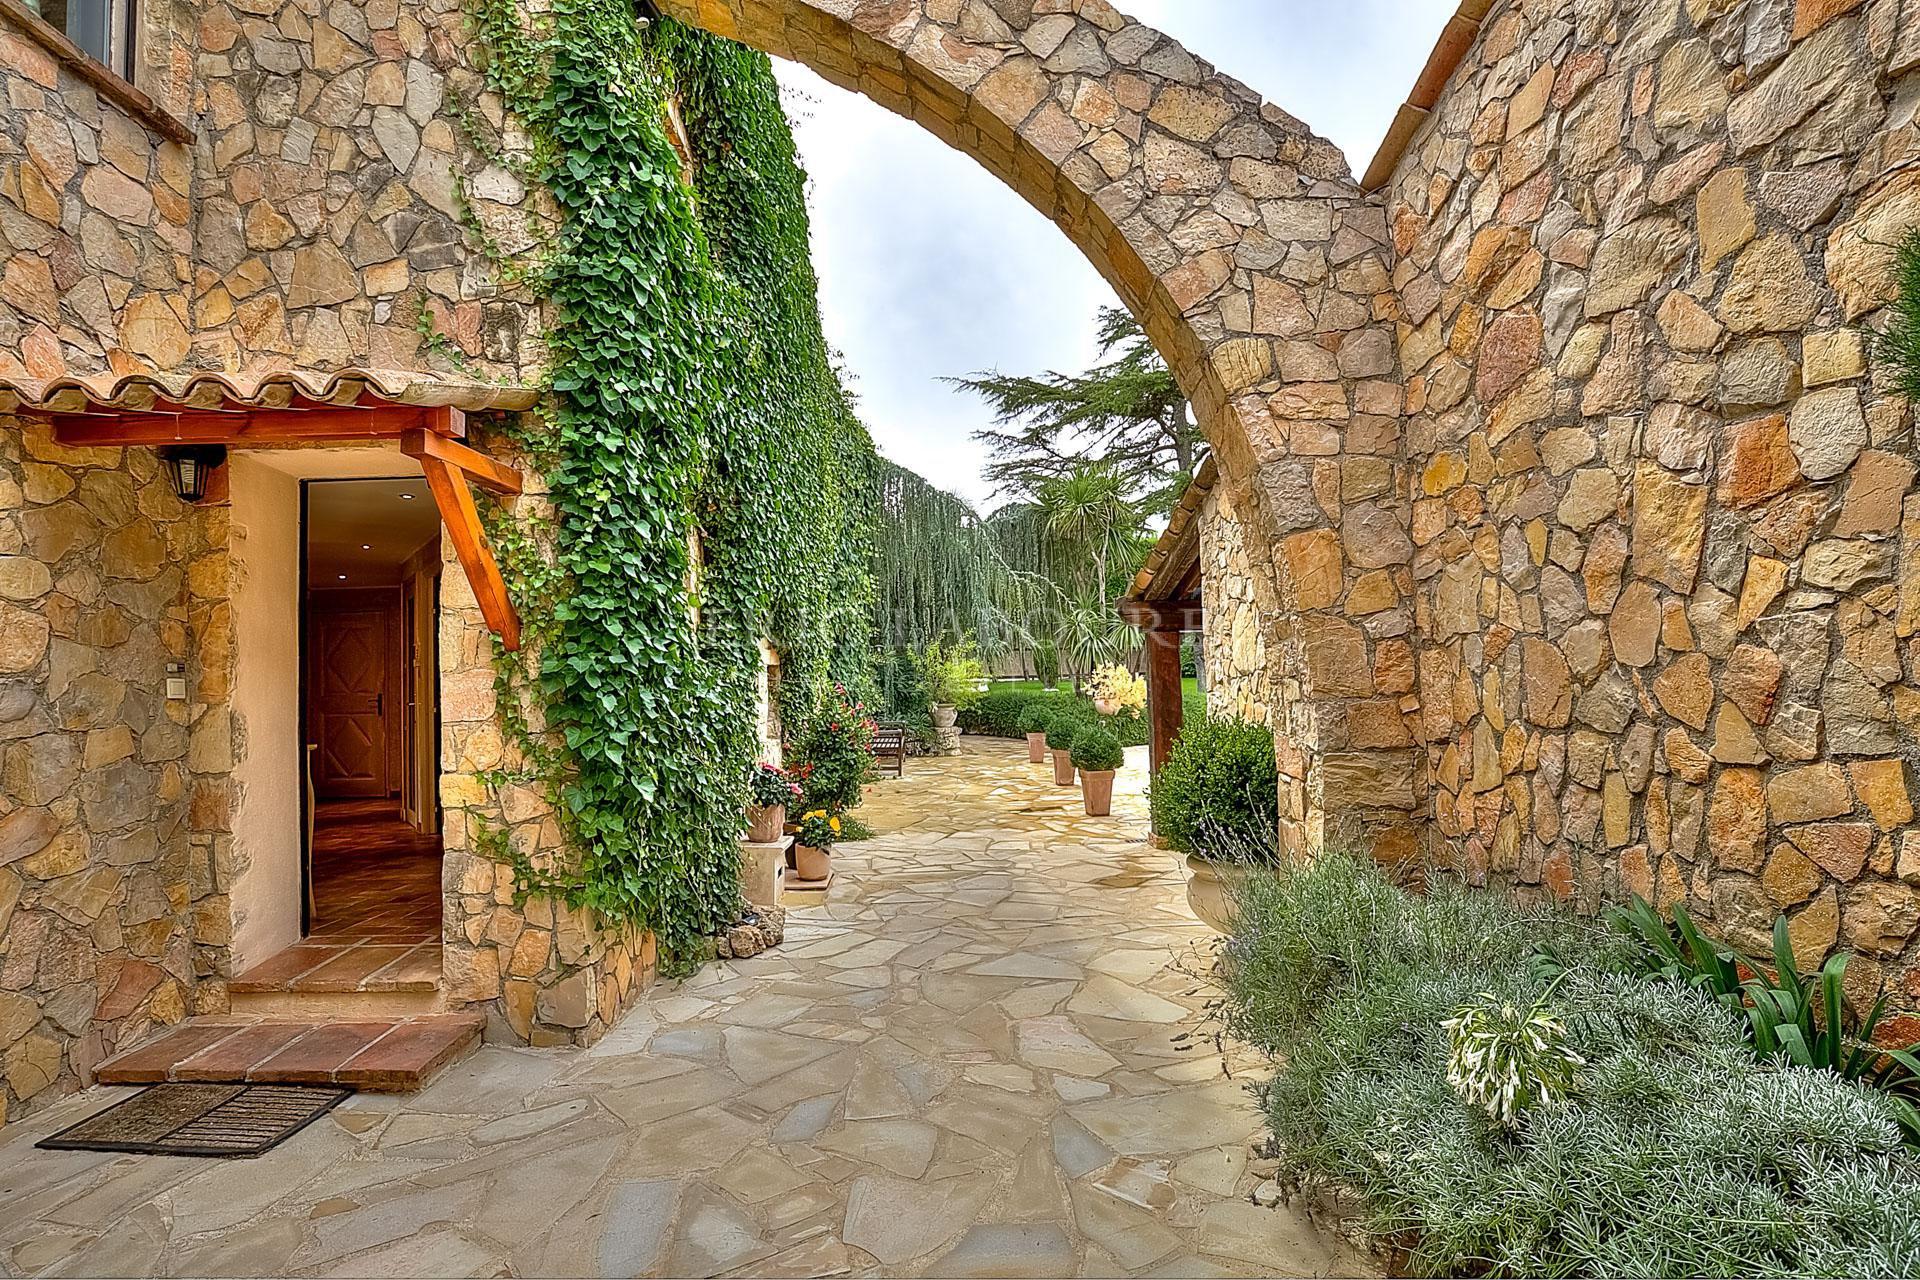 Close to Mougins SCHOOL - Charming stone villa